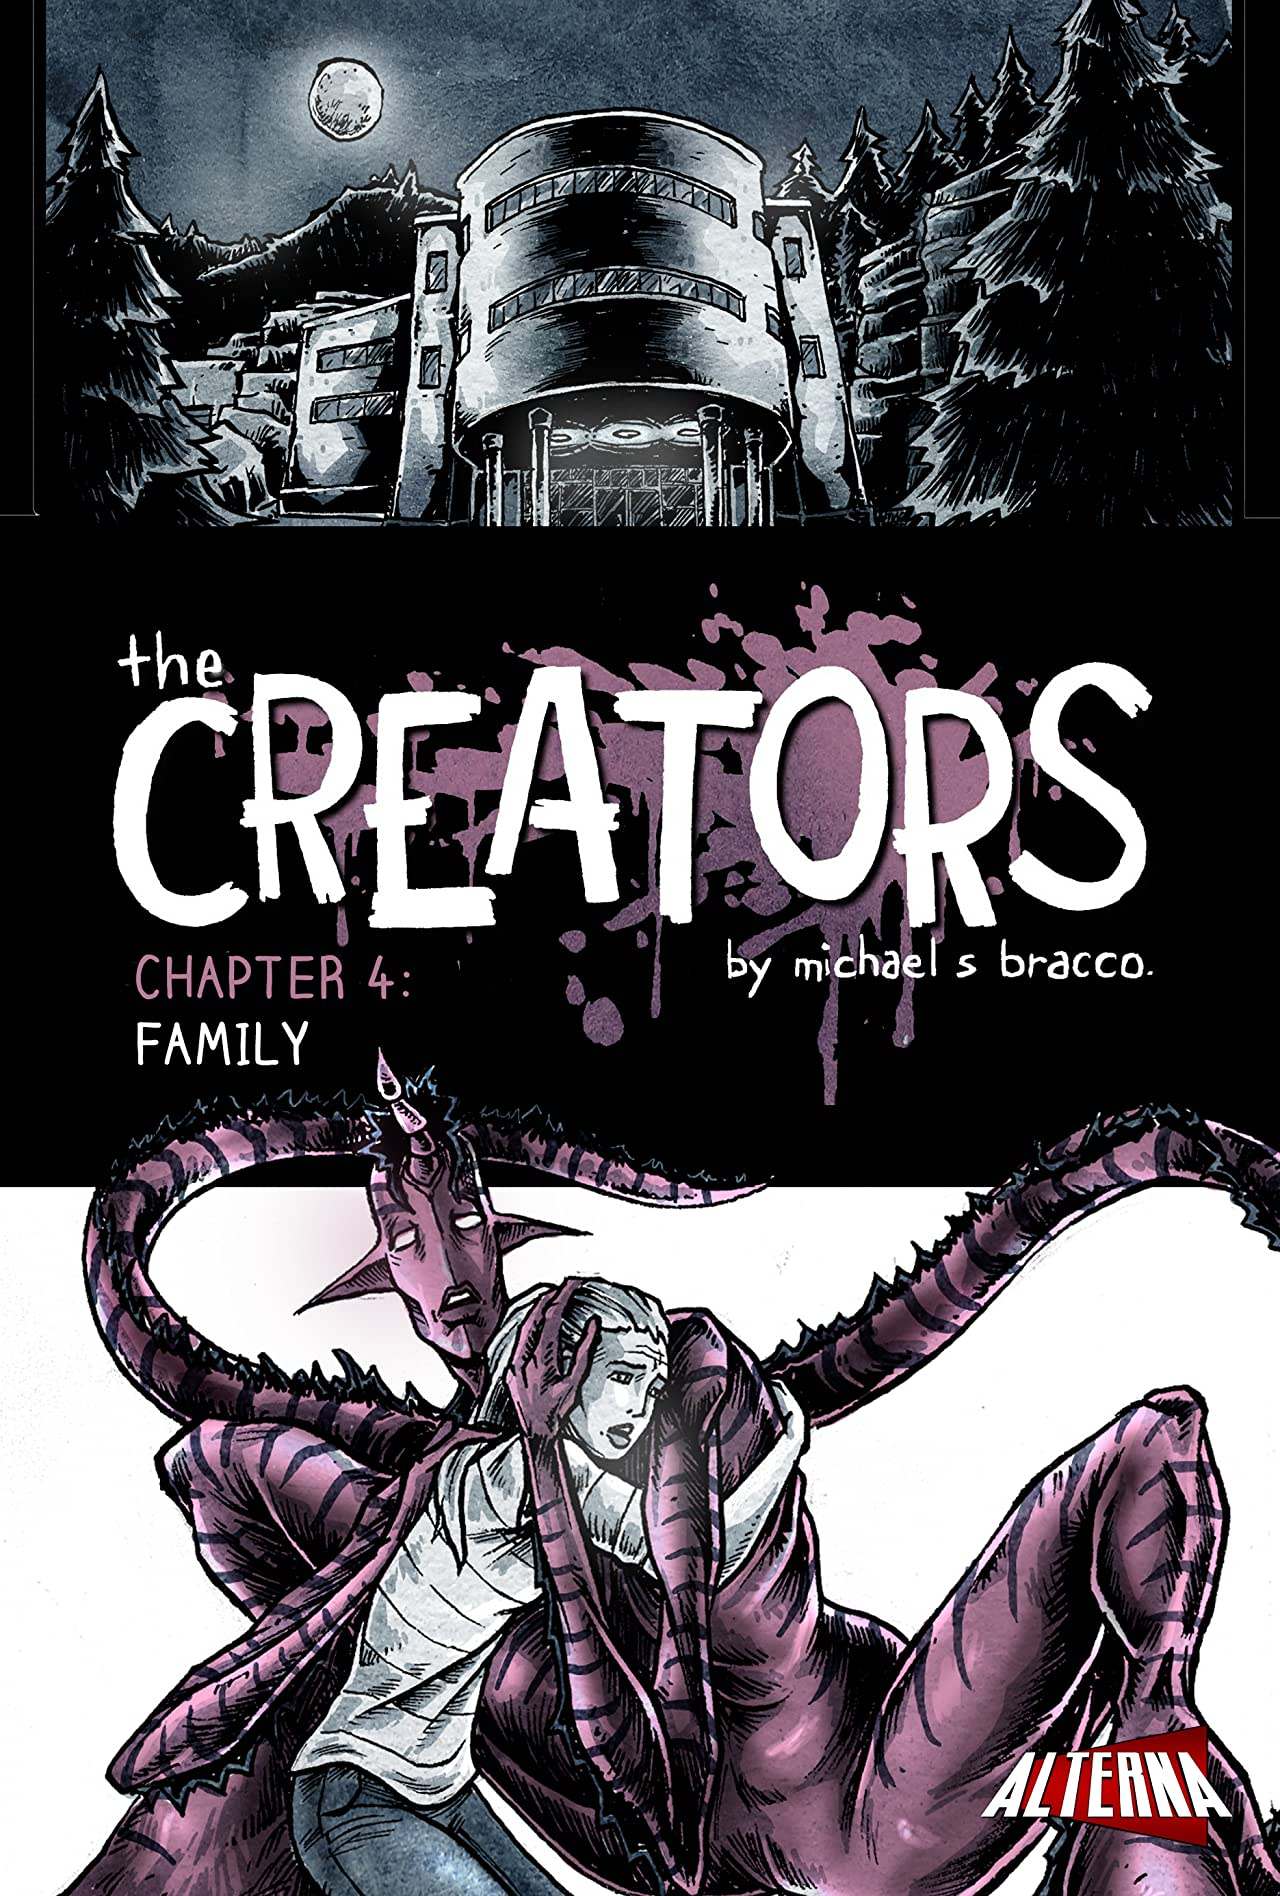 The Creators #4